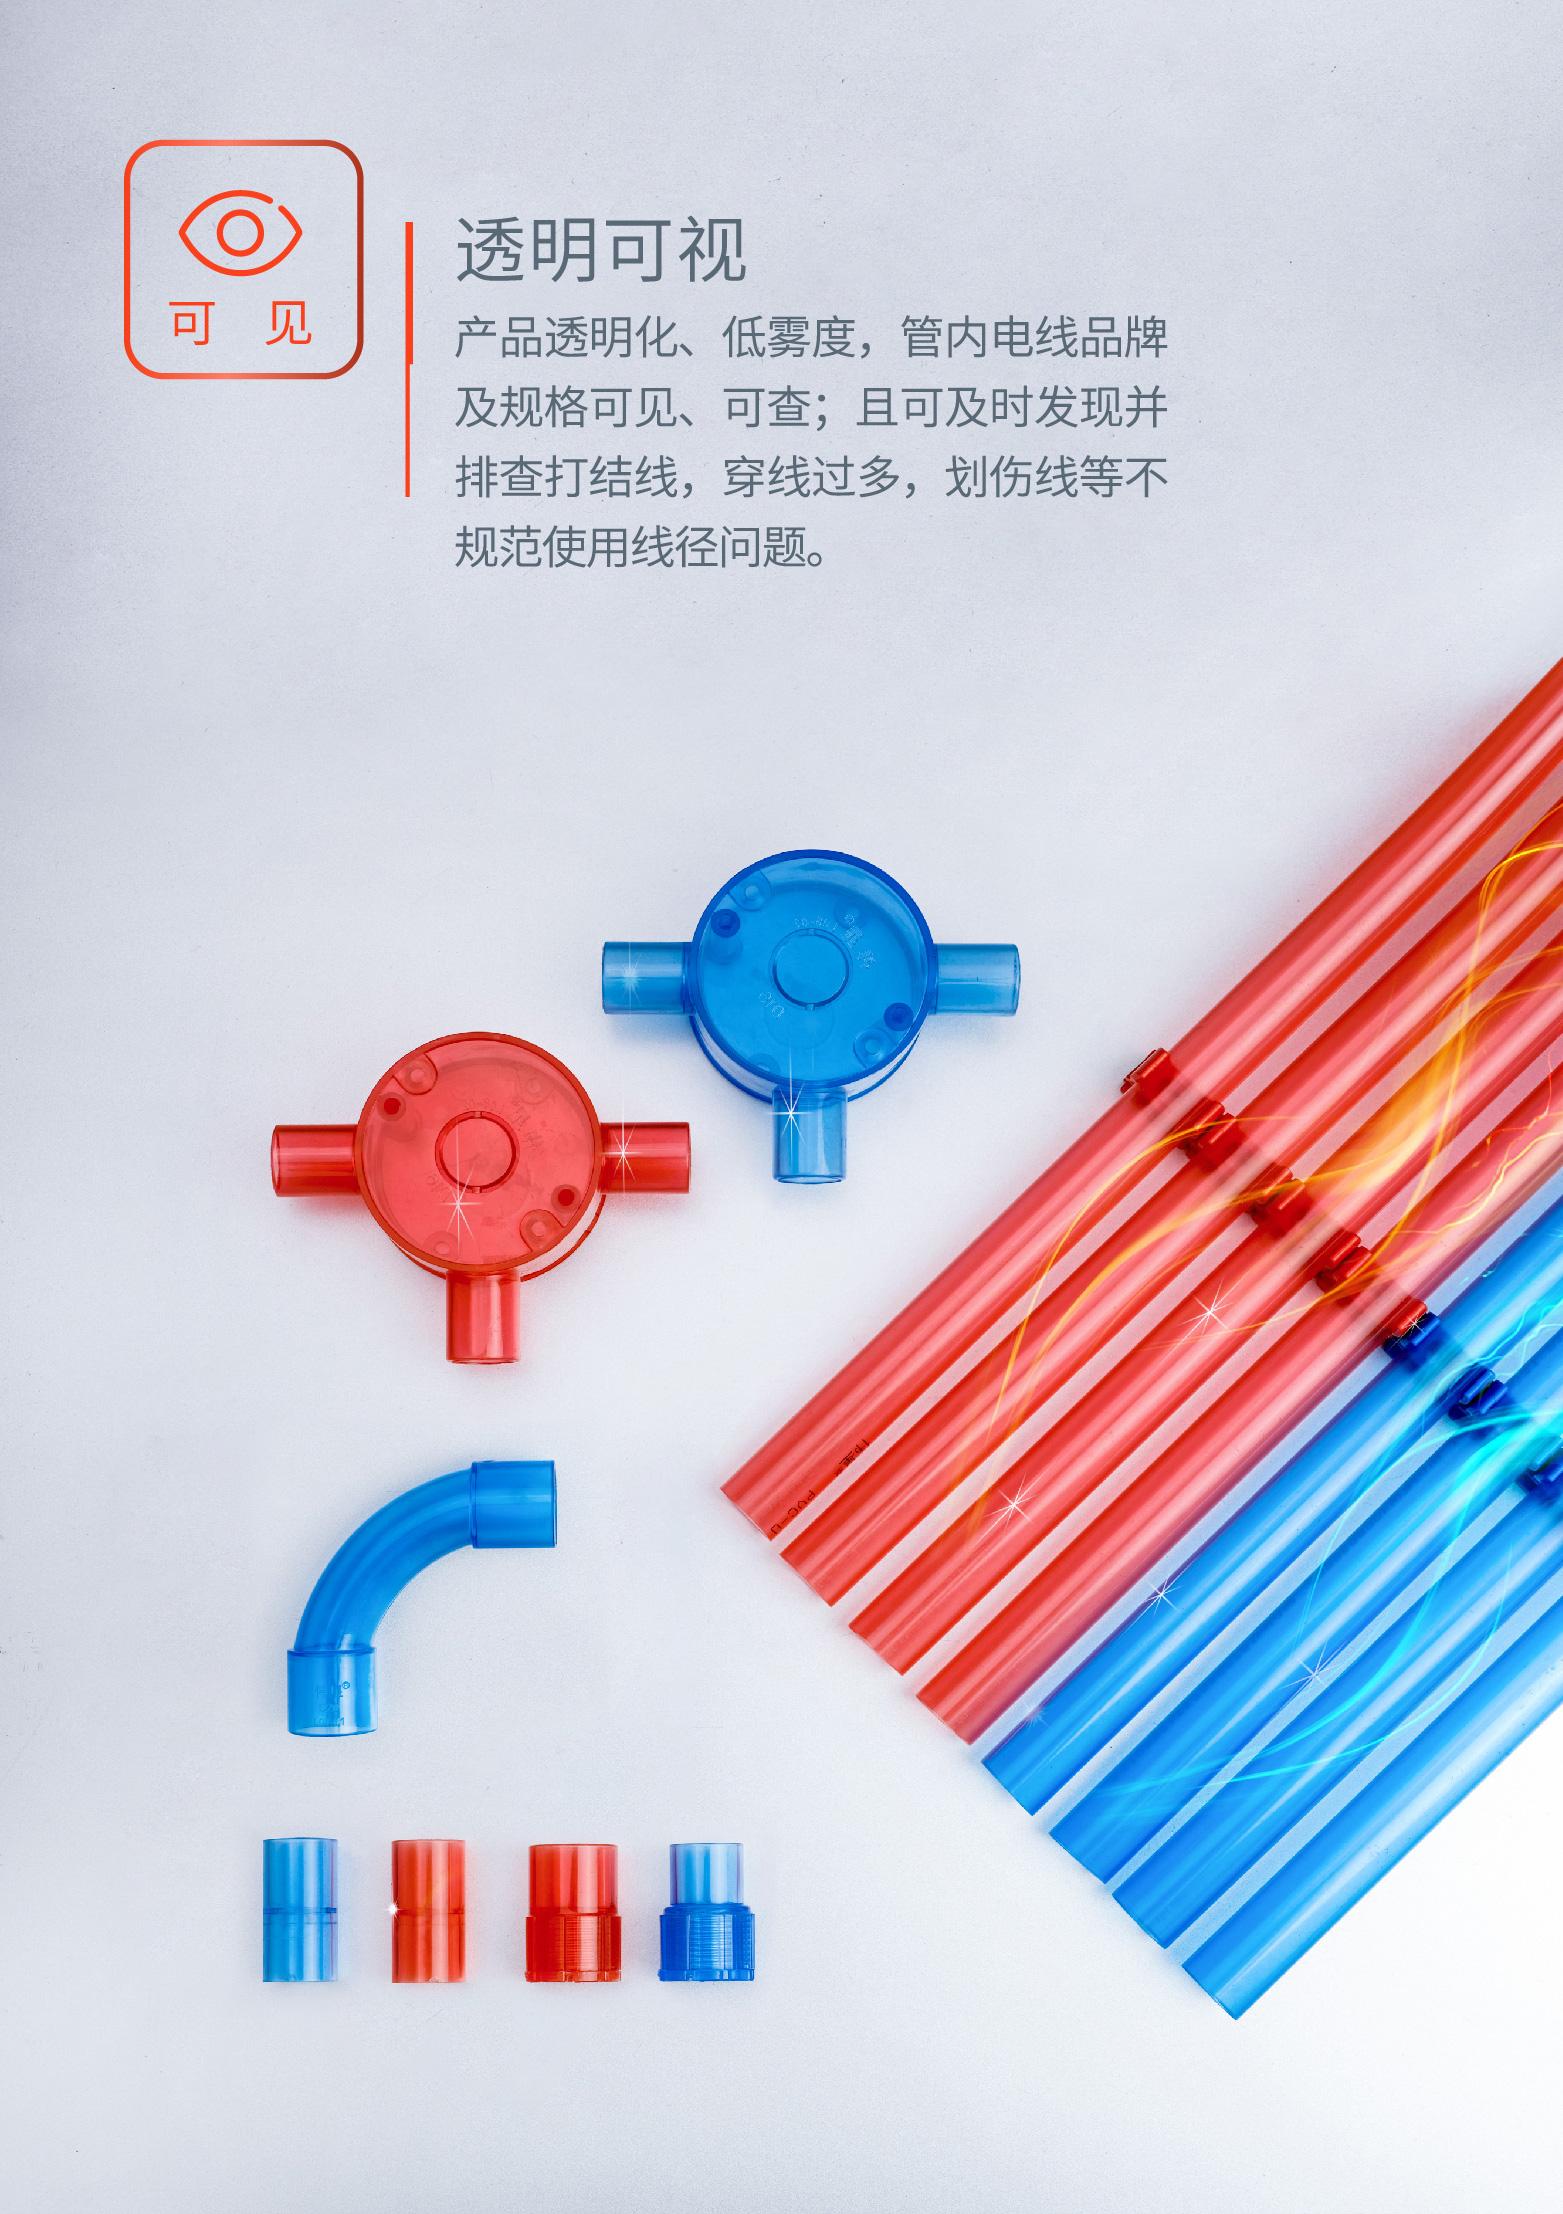 PVC-U可视化电工套管详情页(转曲),(1)_画板-1_02.jpg